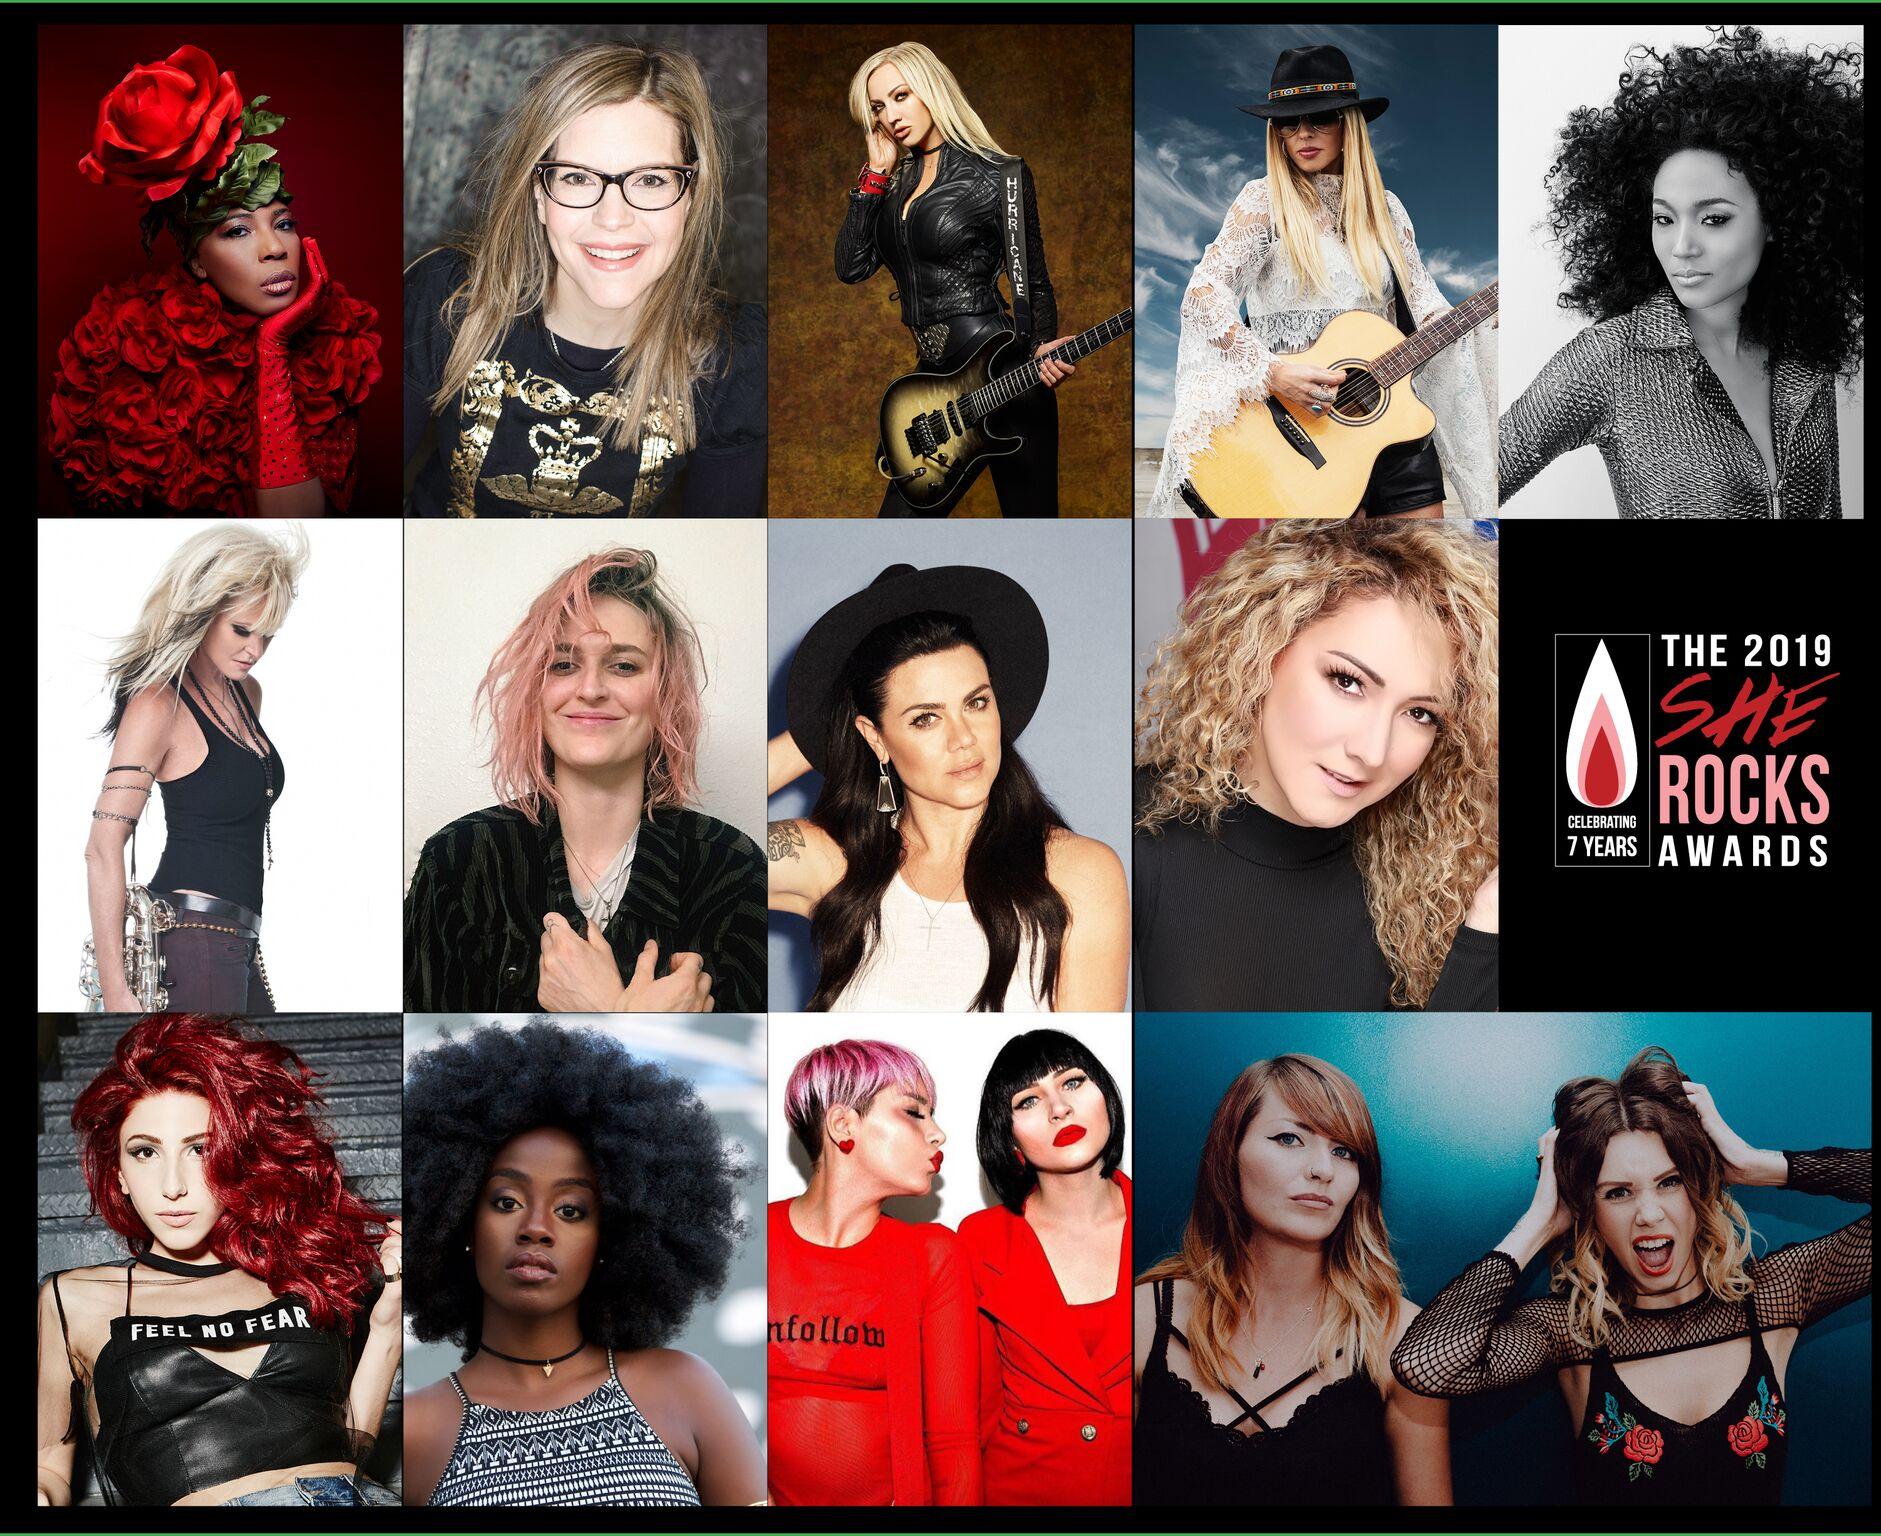 2019 She Rocks Awards Performers Orianthi, Macy Gray, Judith Hill